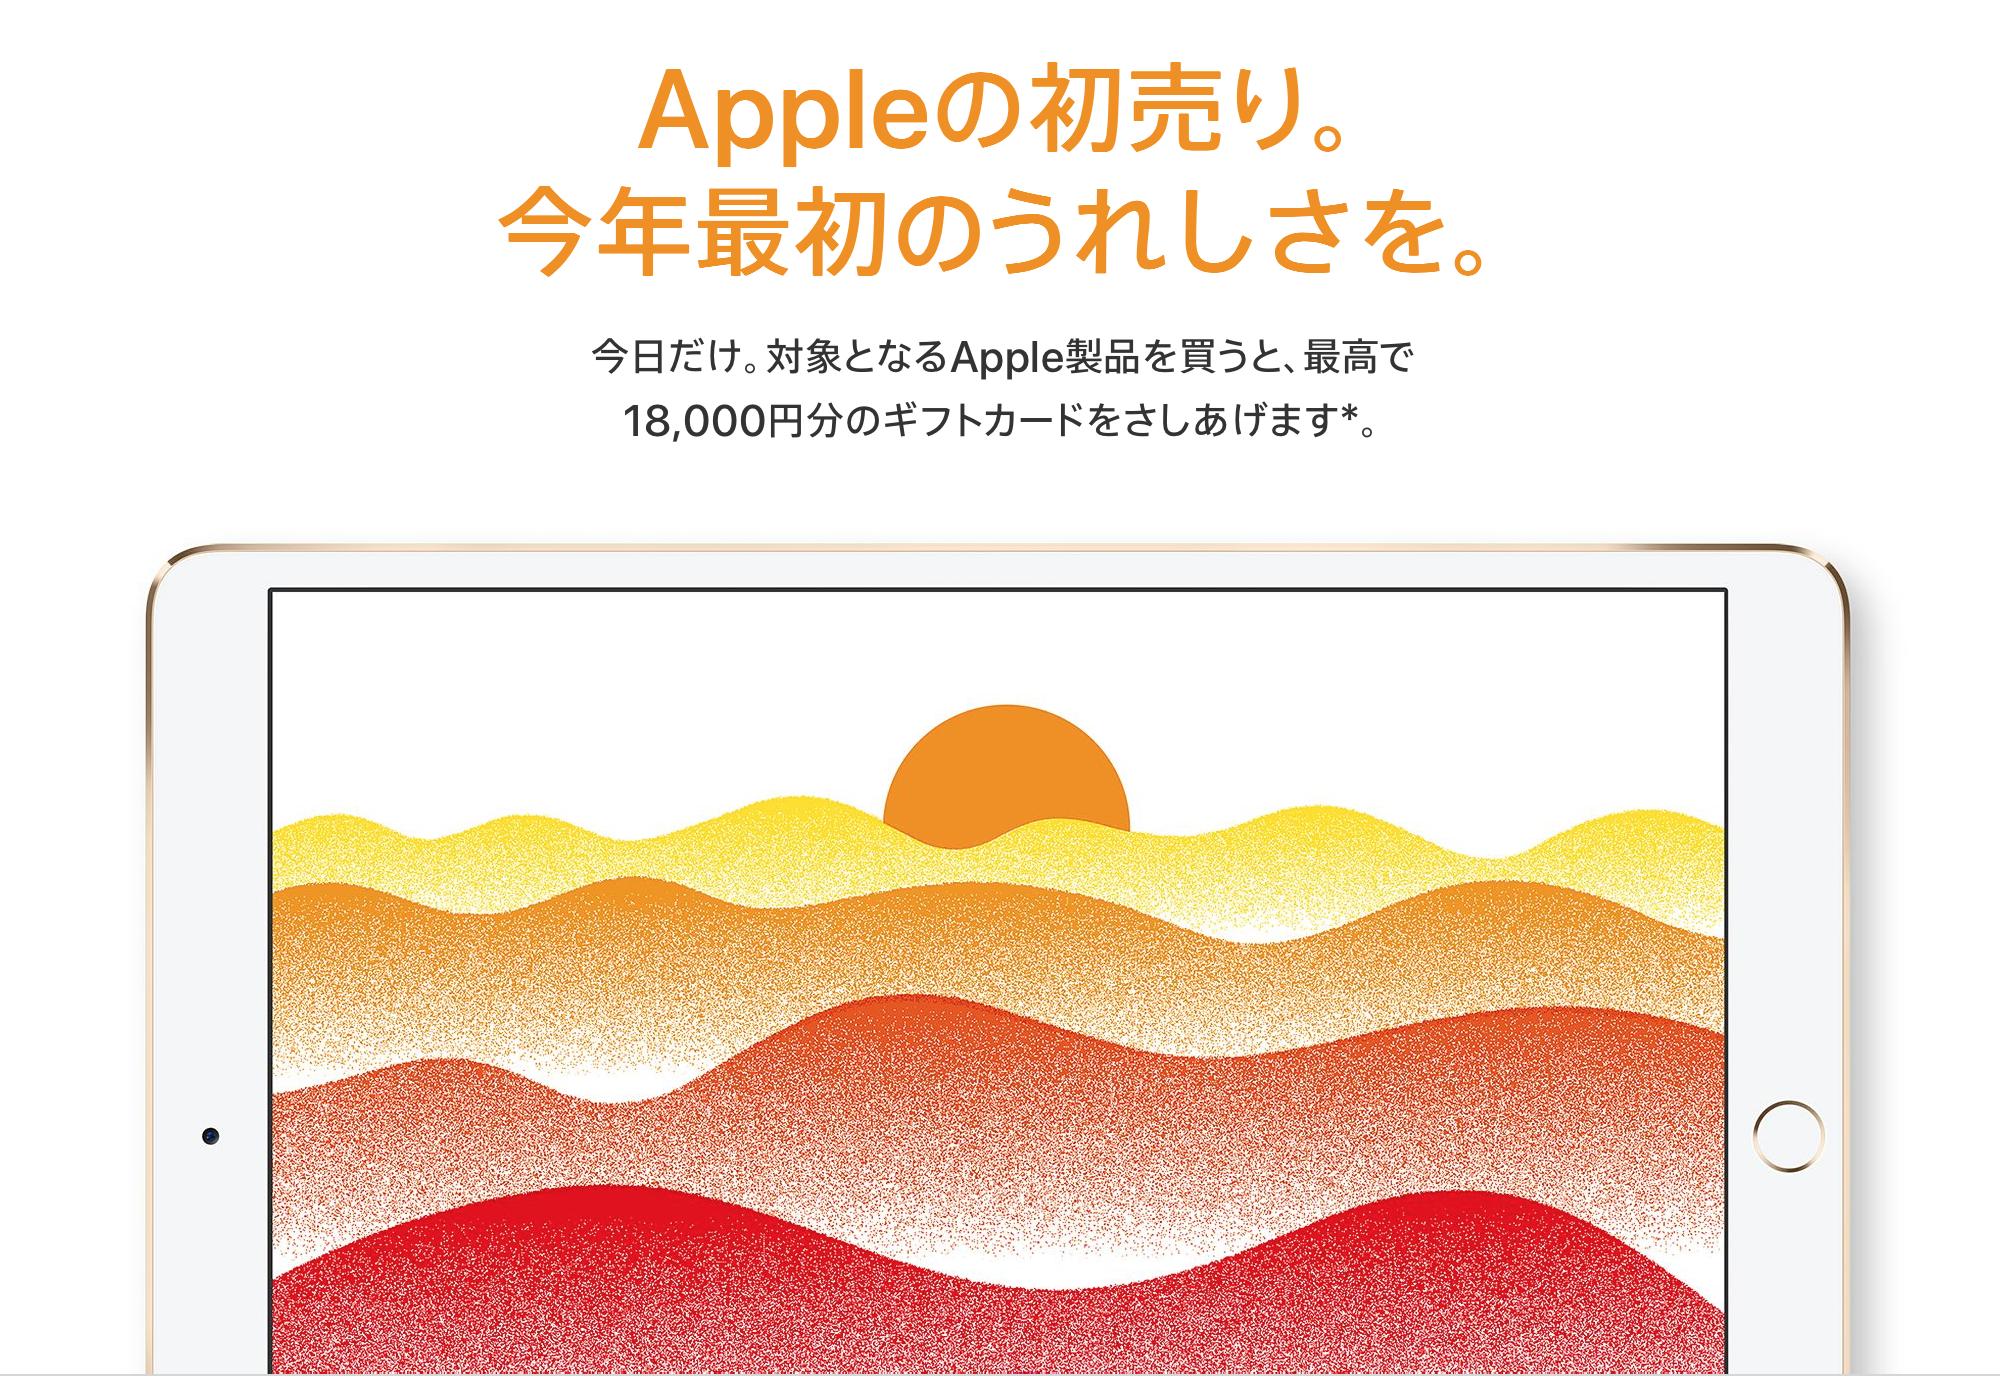 http://raizo.daa.jp/image/applenewyarsale2018.png